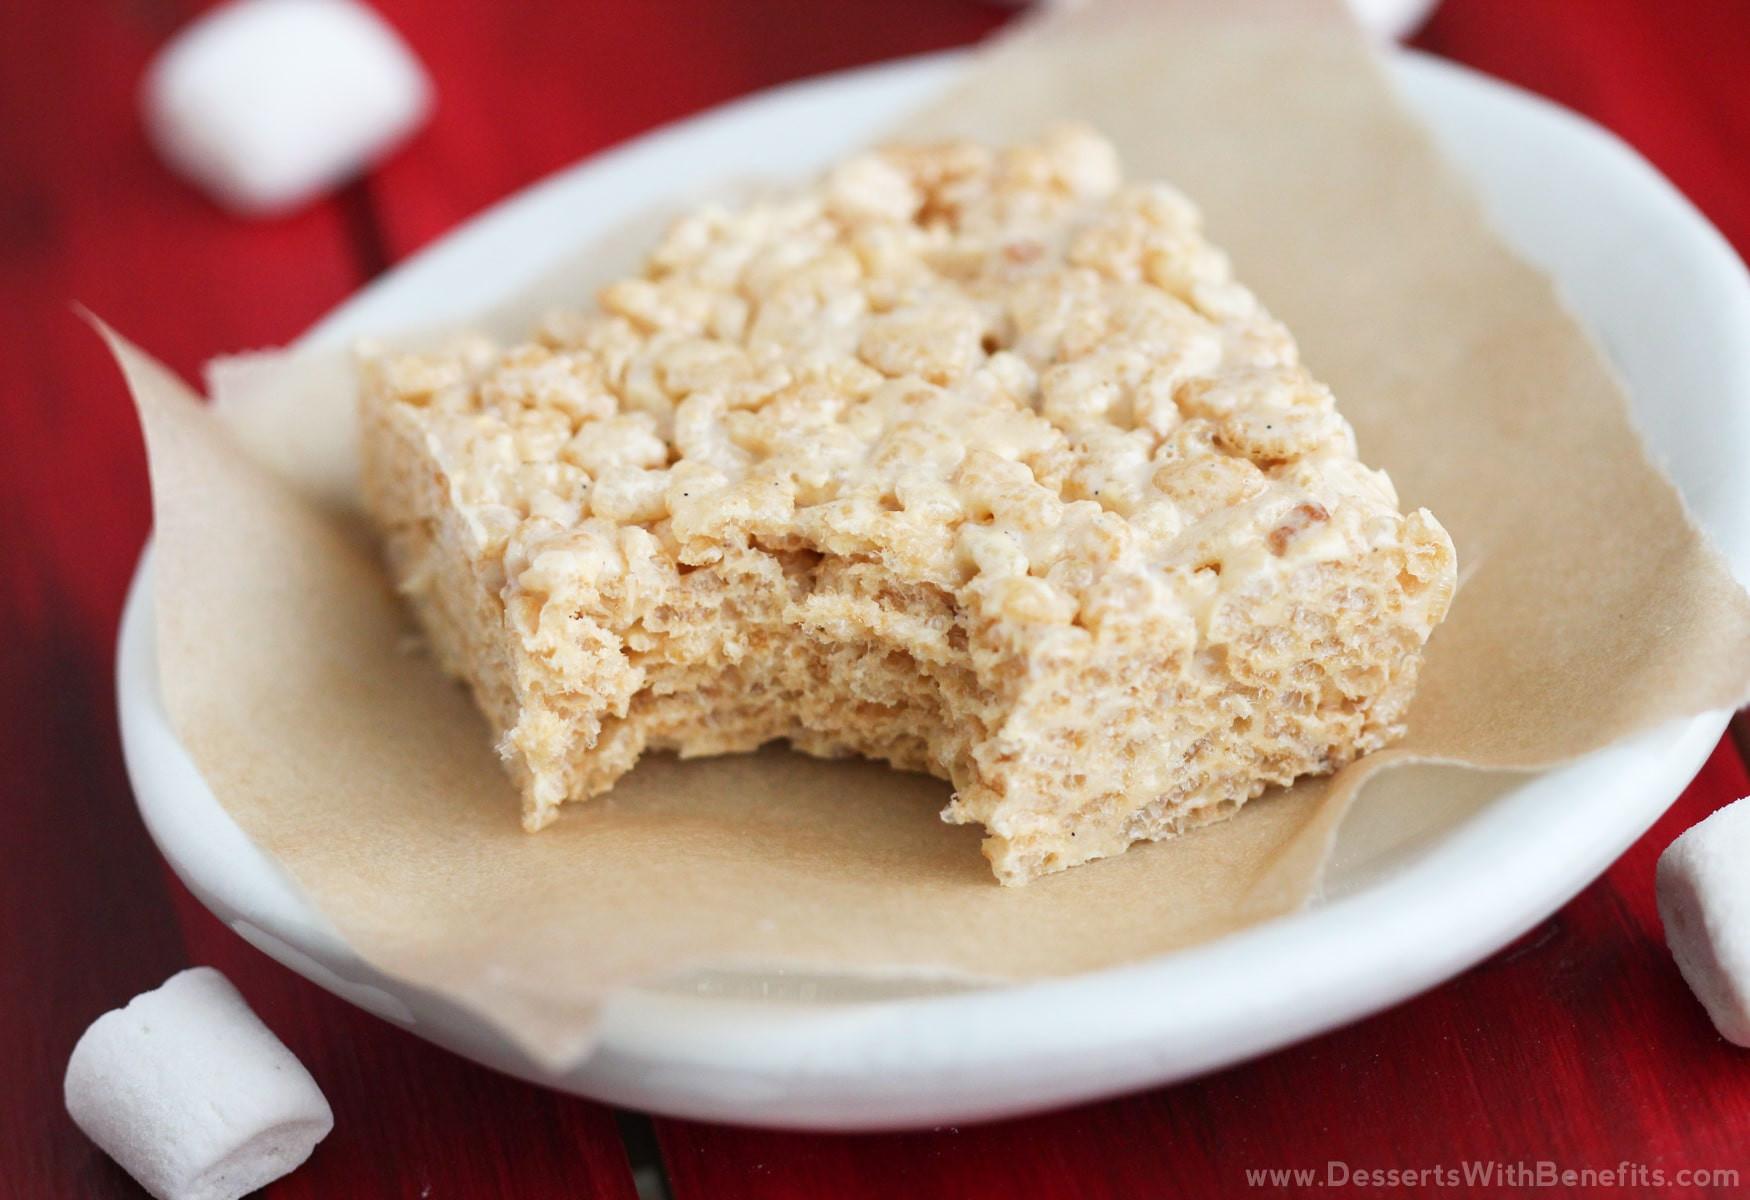 Healthy Quick Desserts  Healthy Gluten Free Protein Krispy Treats Recipe